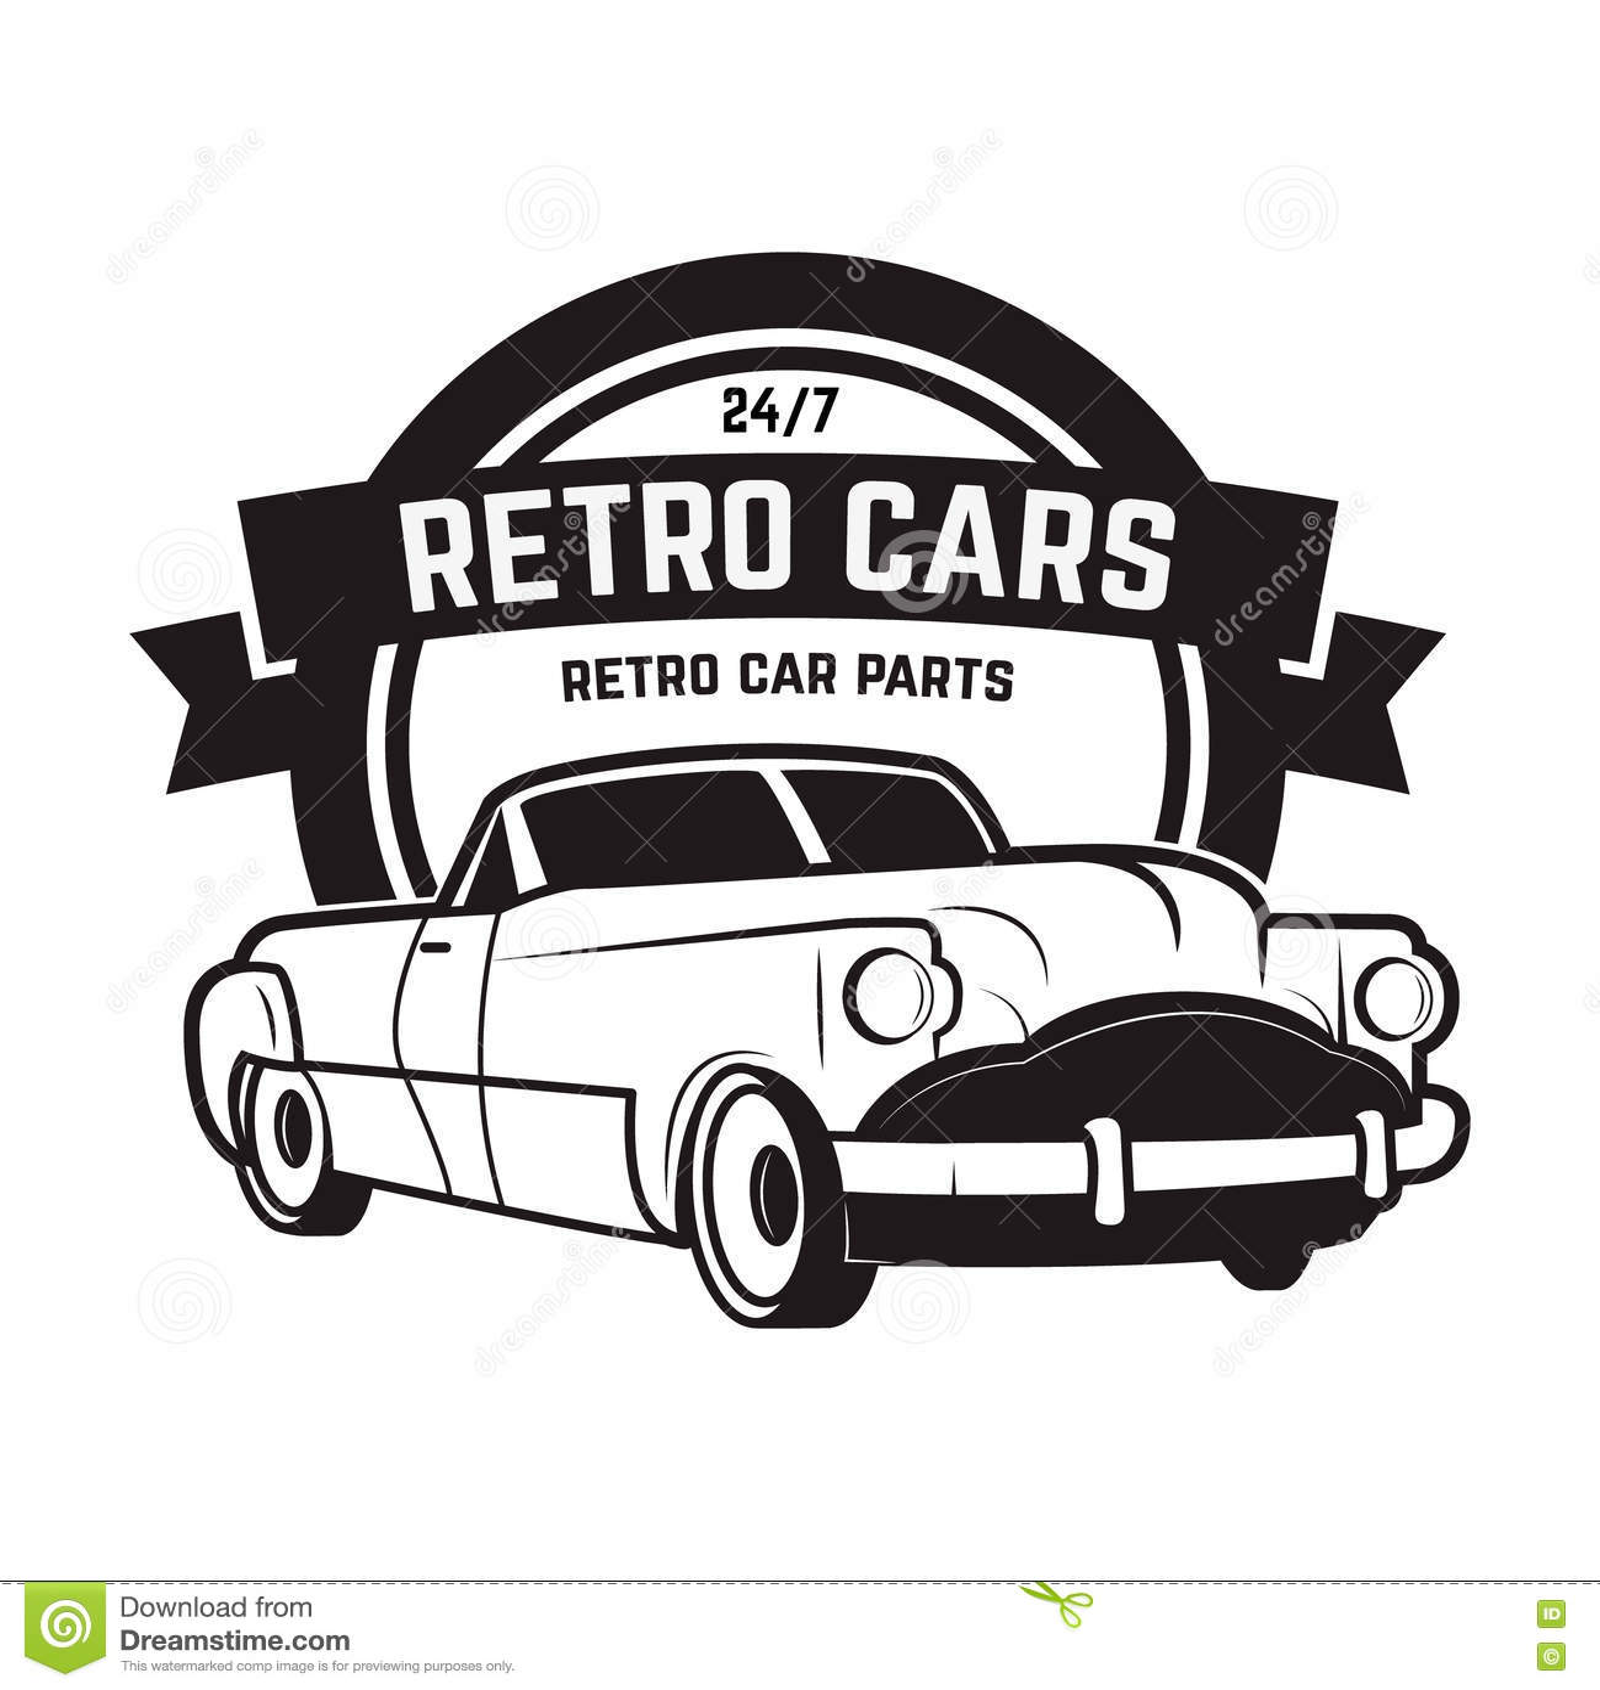 Vintage Cars Sale. Retro Car Icon. Car Repair. Stock